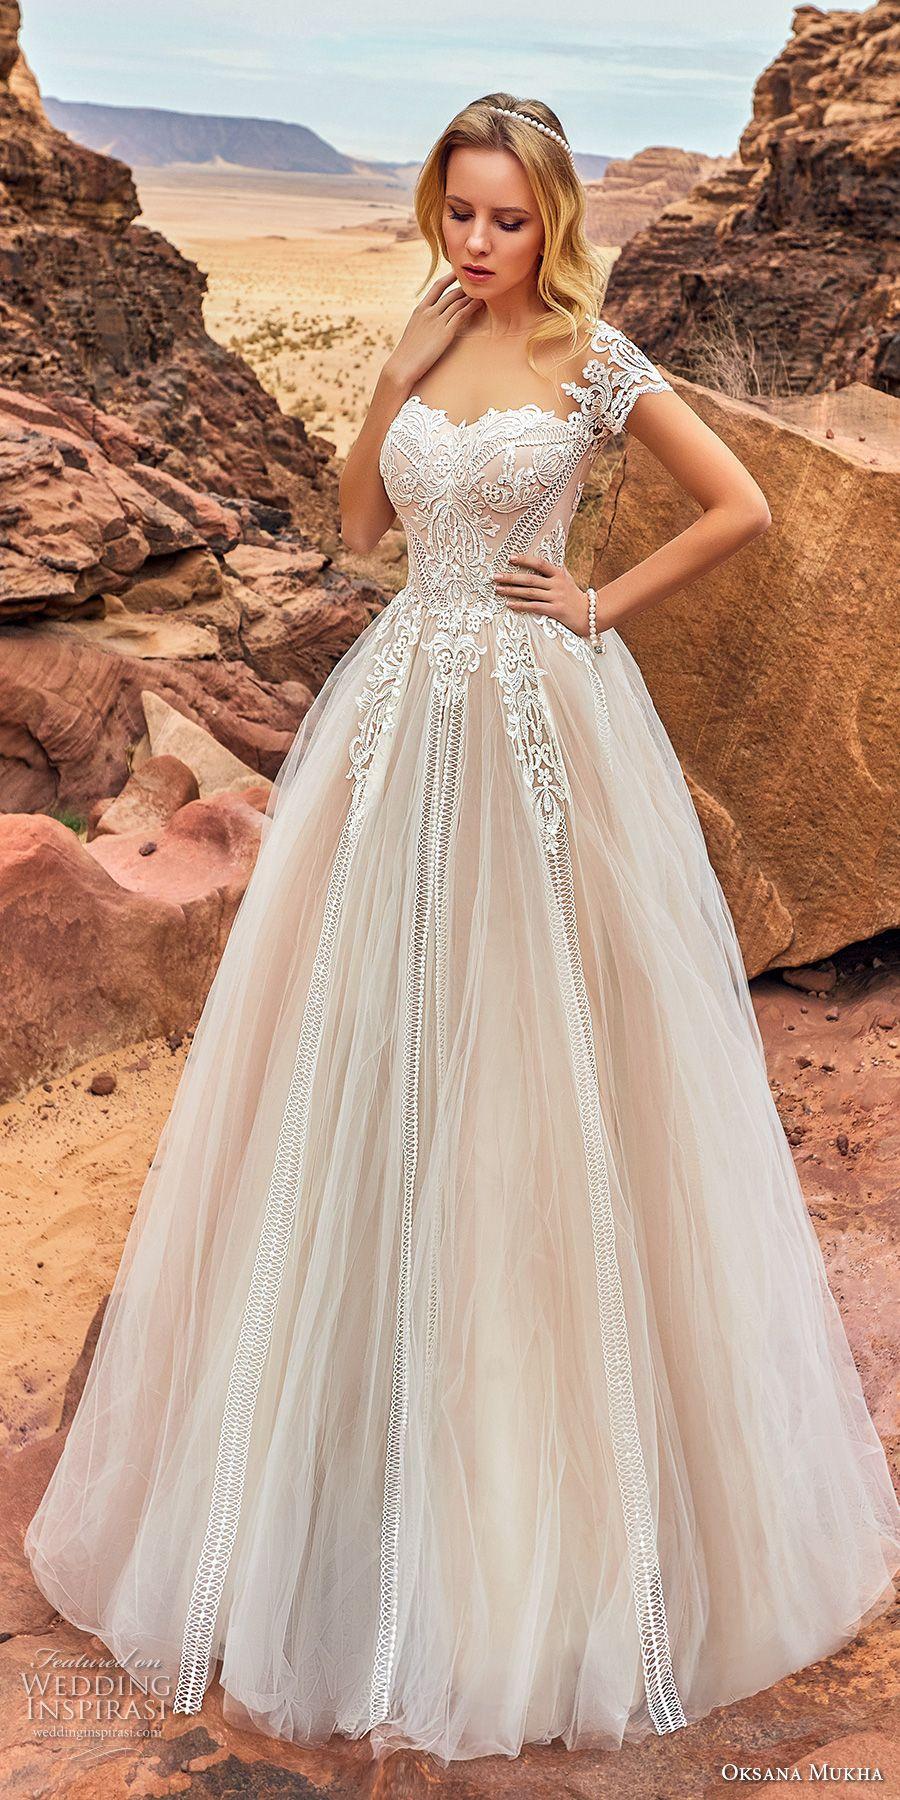 Oksana mukha wedding dresses to be romantic and the oujays